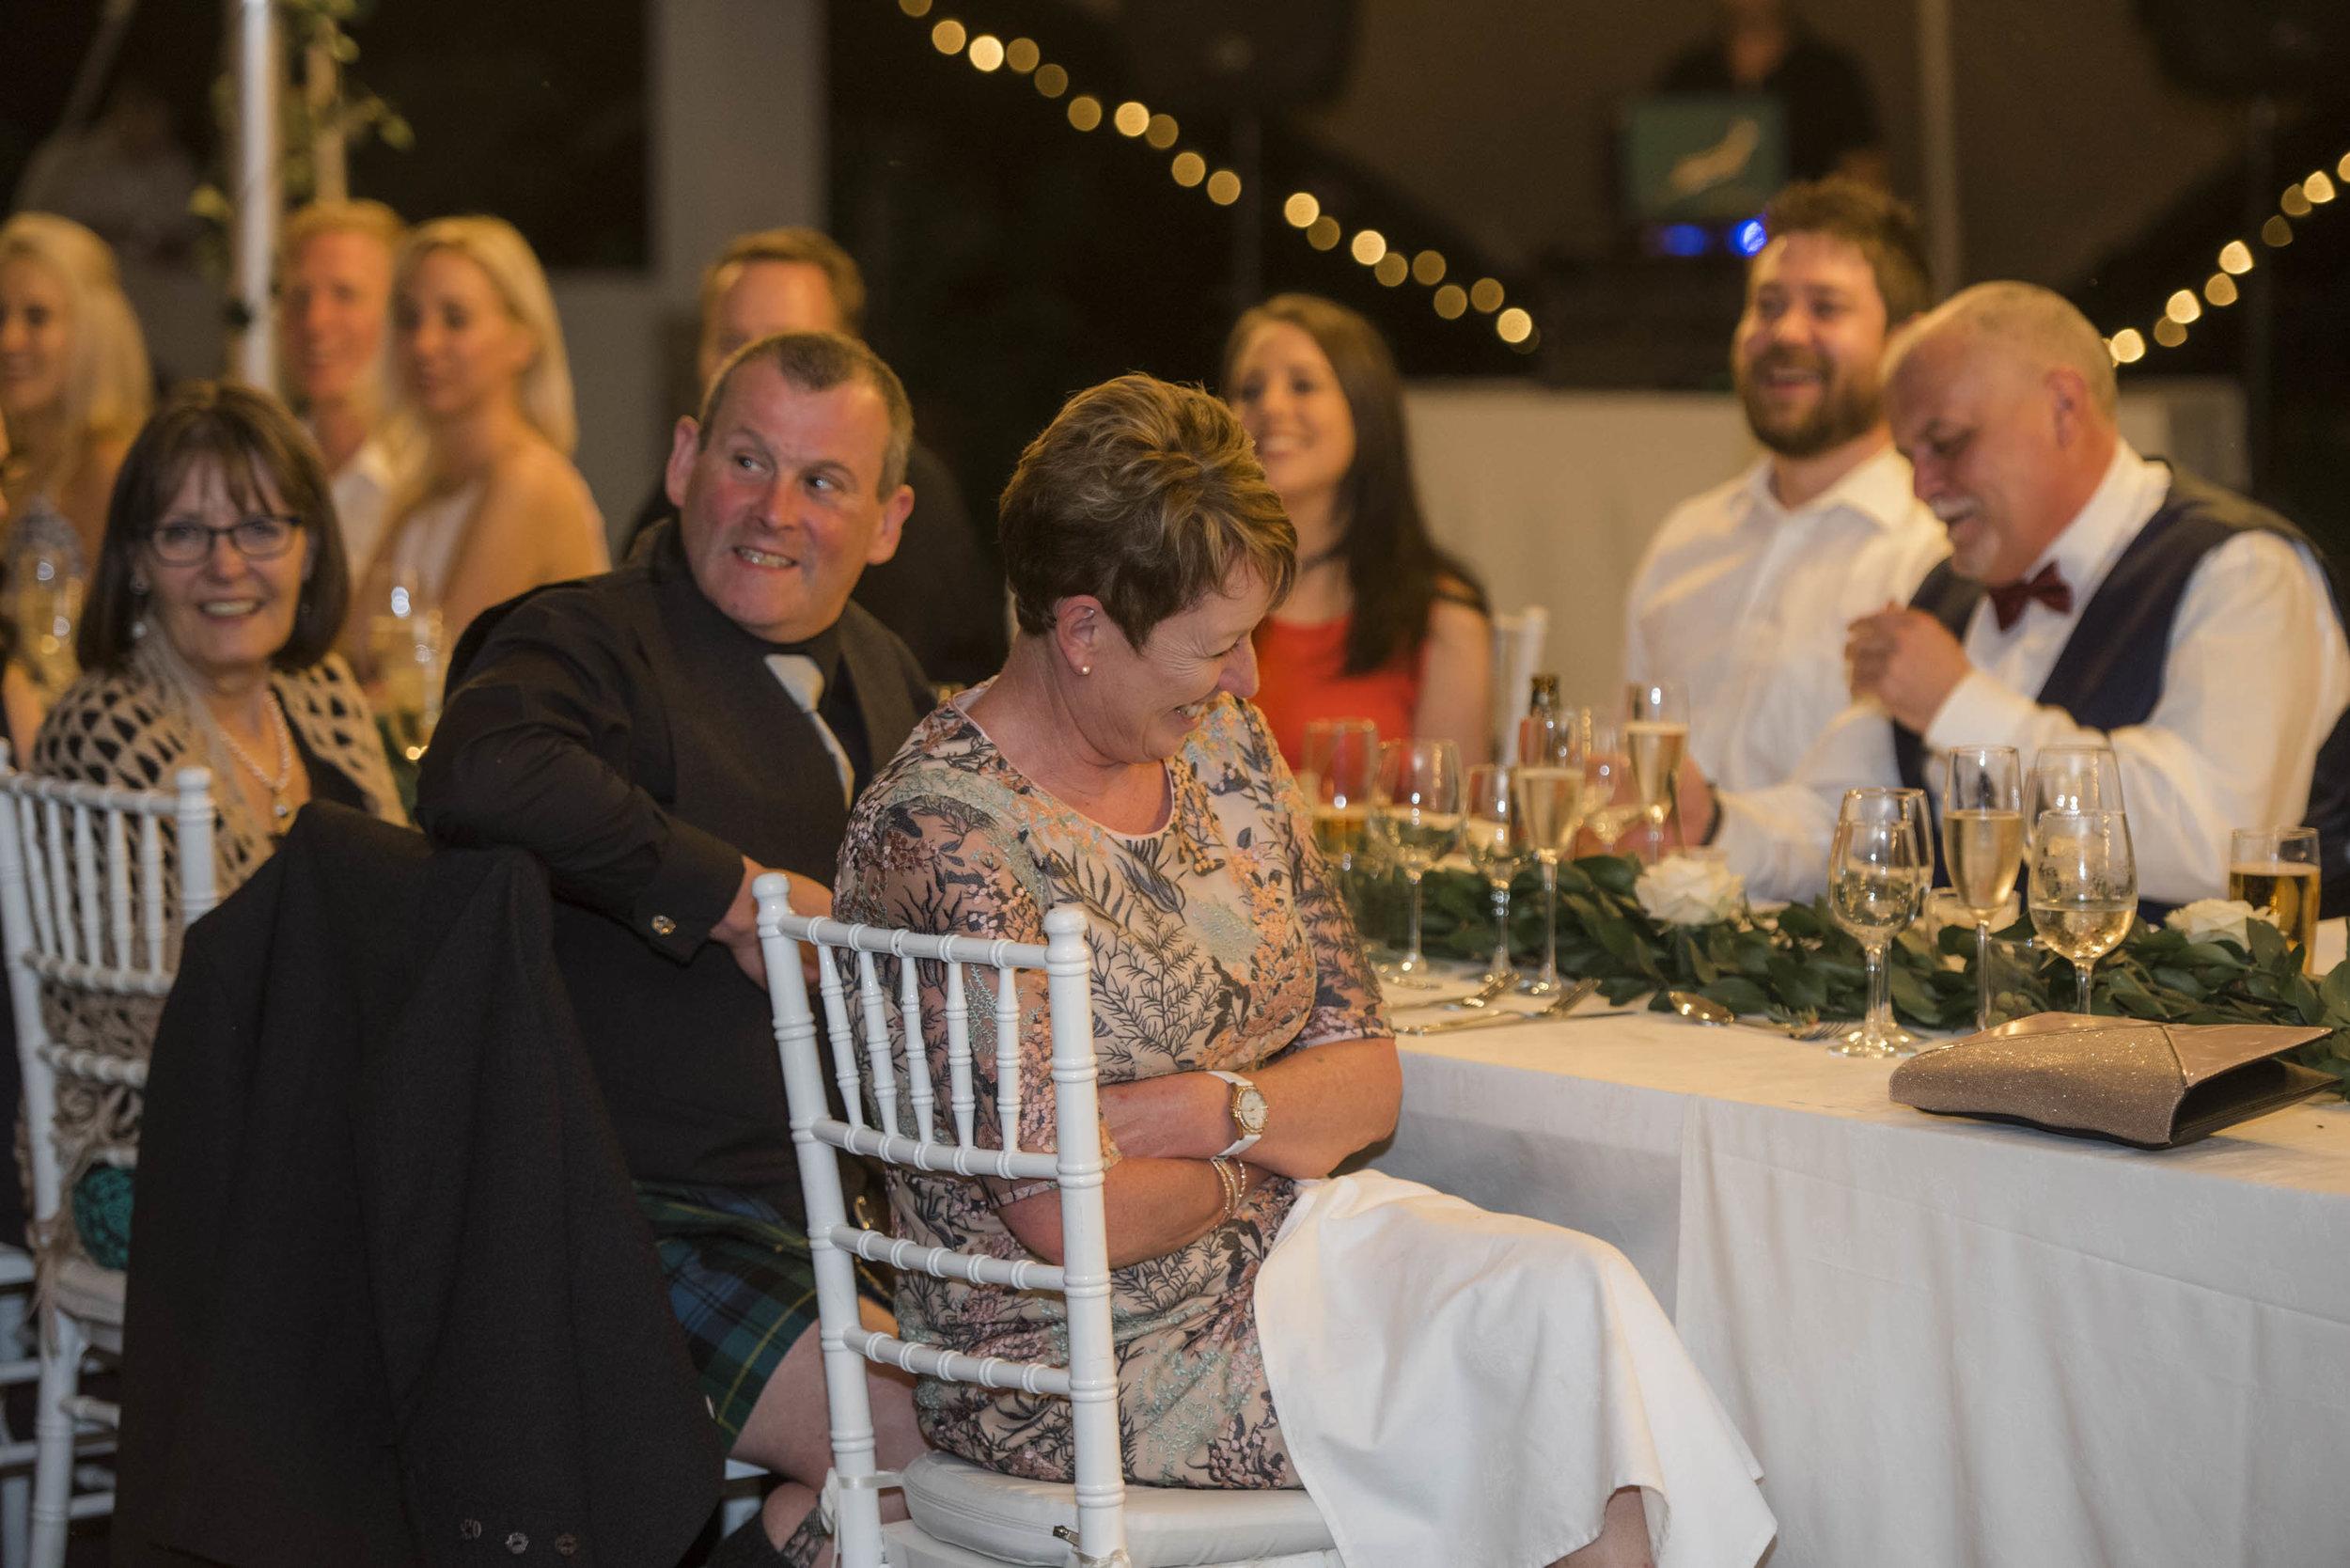 104-natural-wedding-photographers-johannesburg.JPG